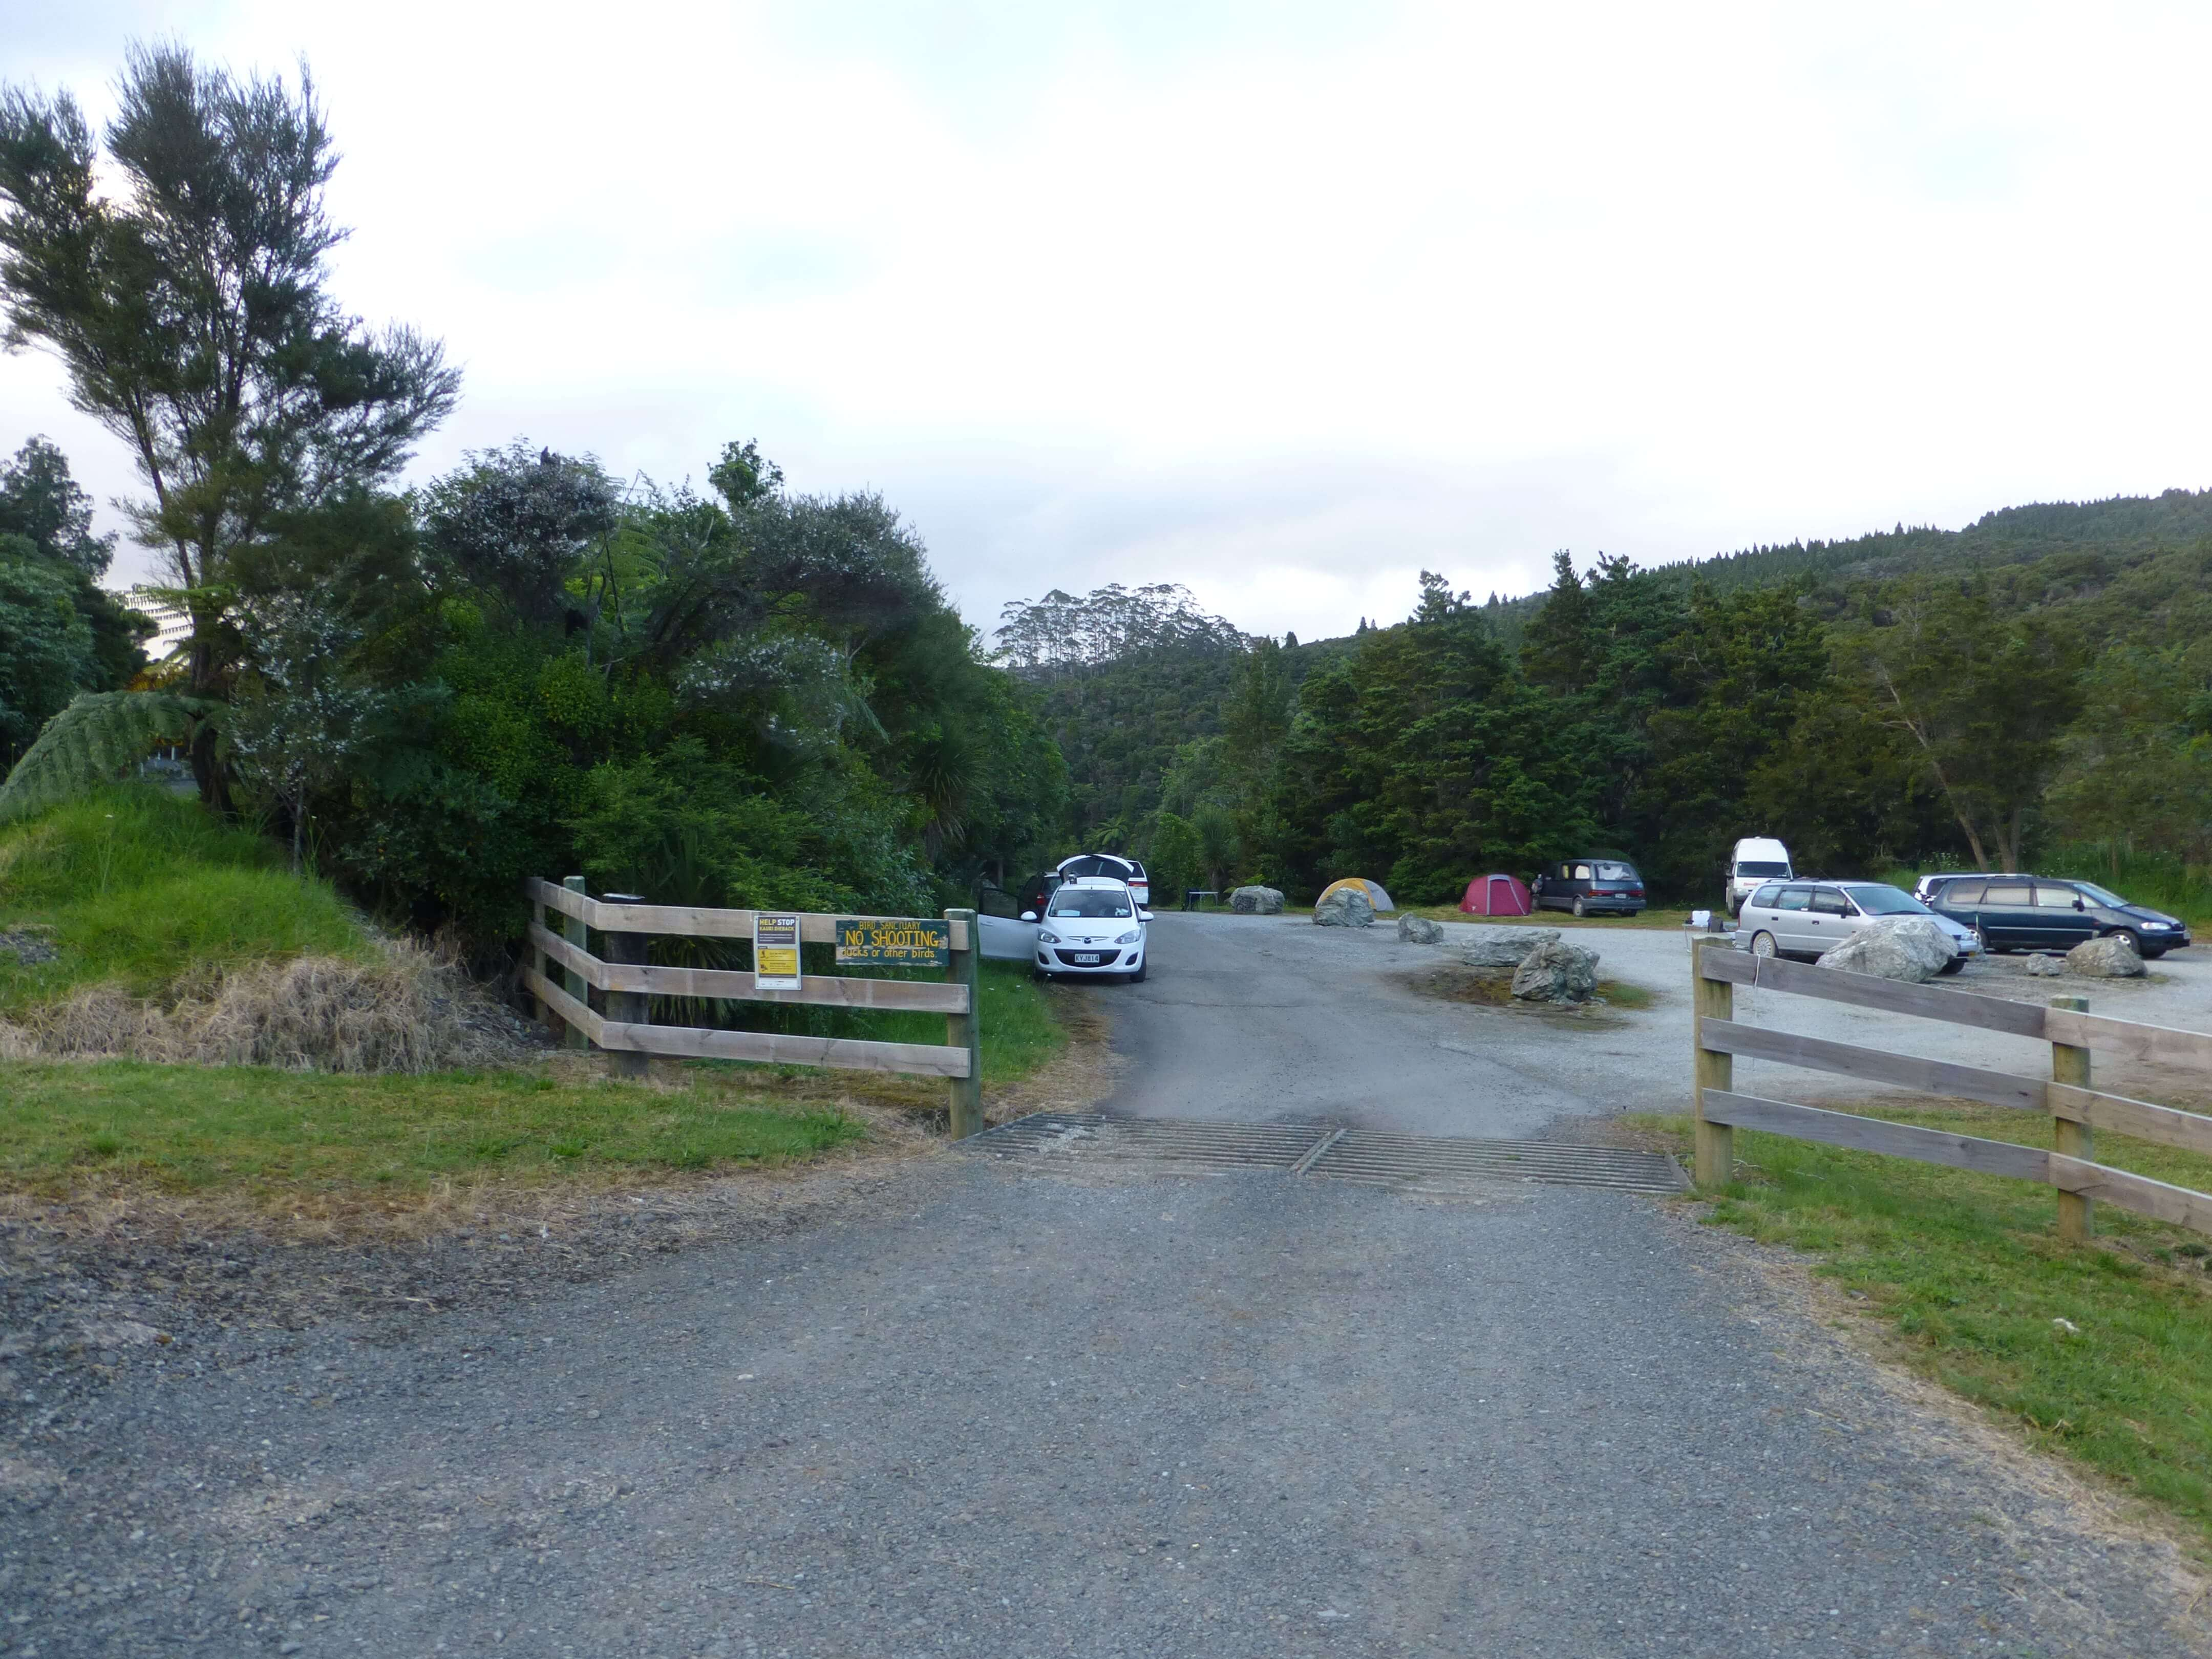 Raetea Camping Area 2